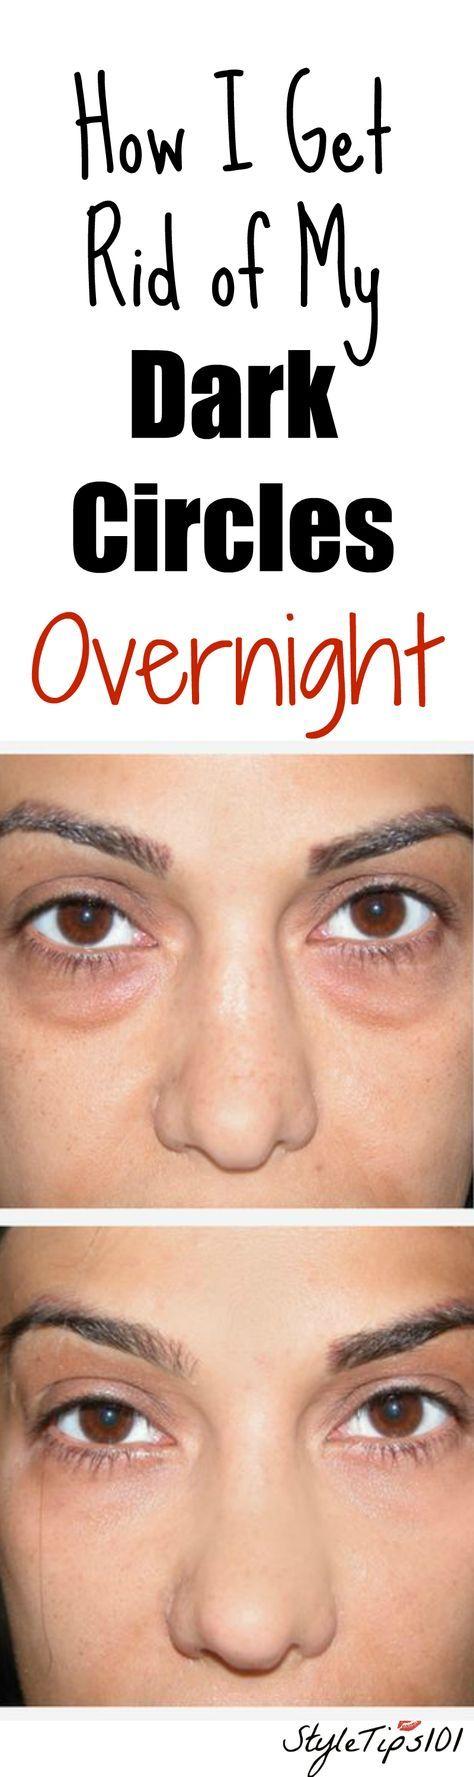 How to Get Rid of Dark Circles Overnight   Dark circles ...